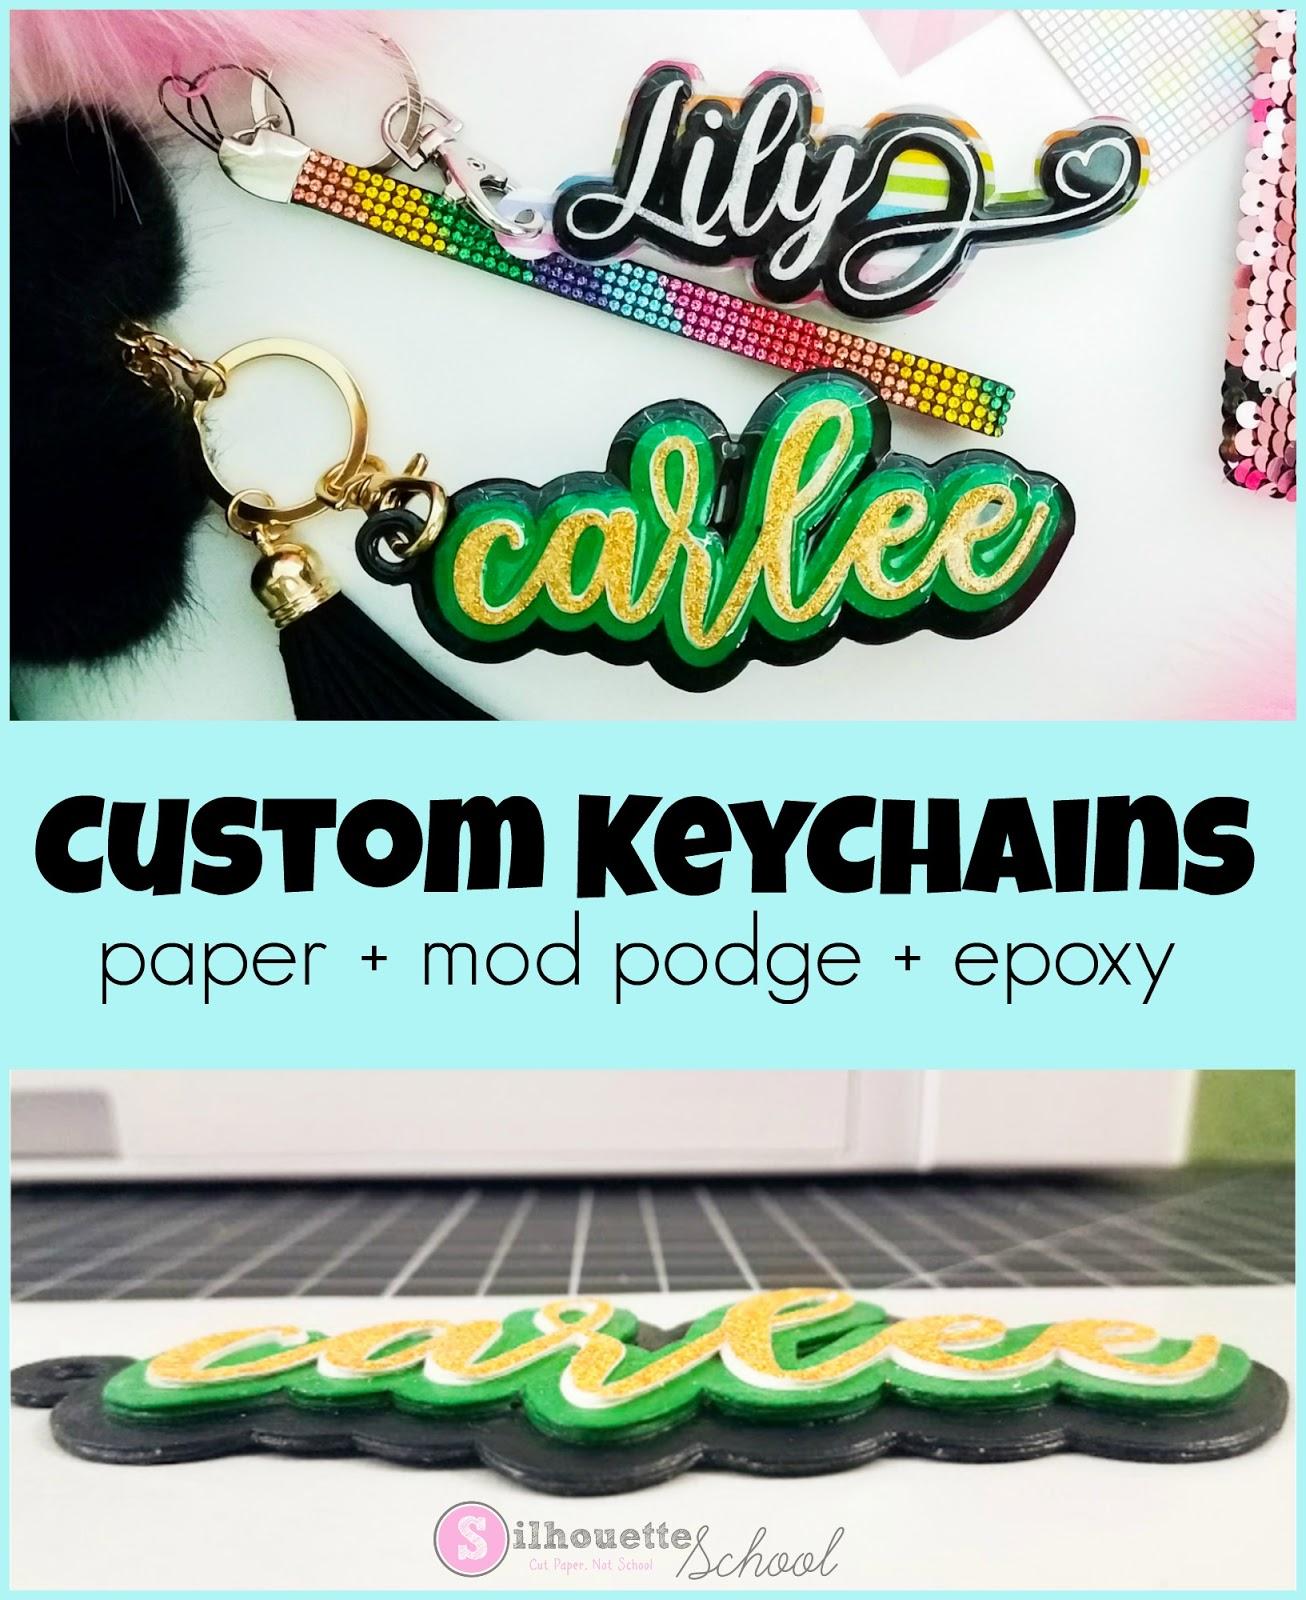 Resin custom keychains